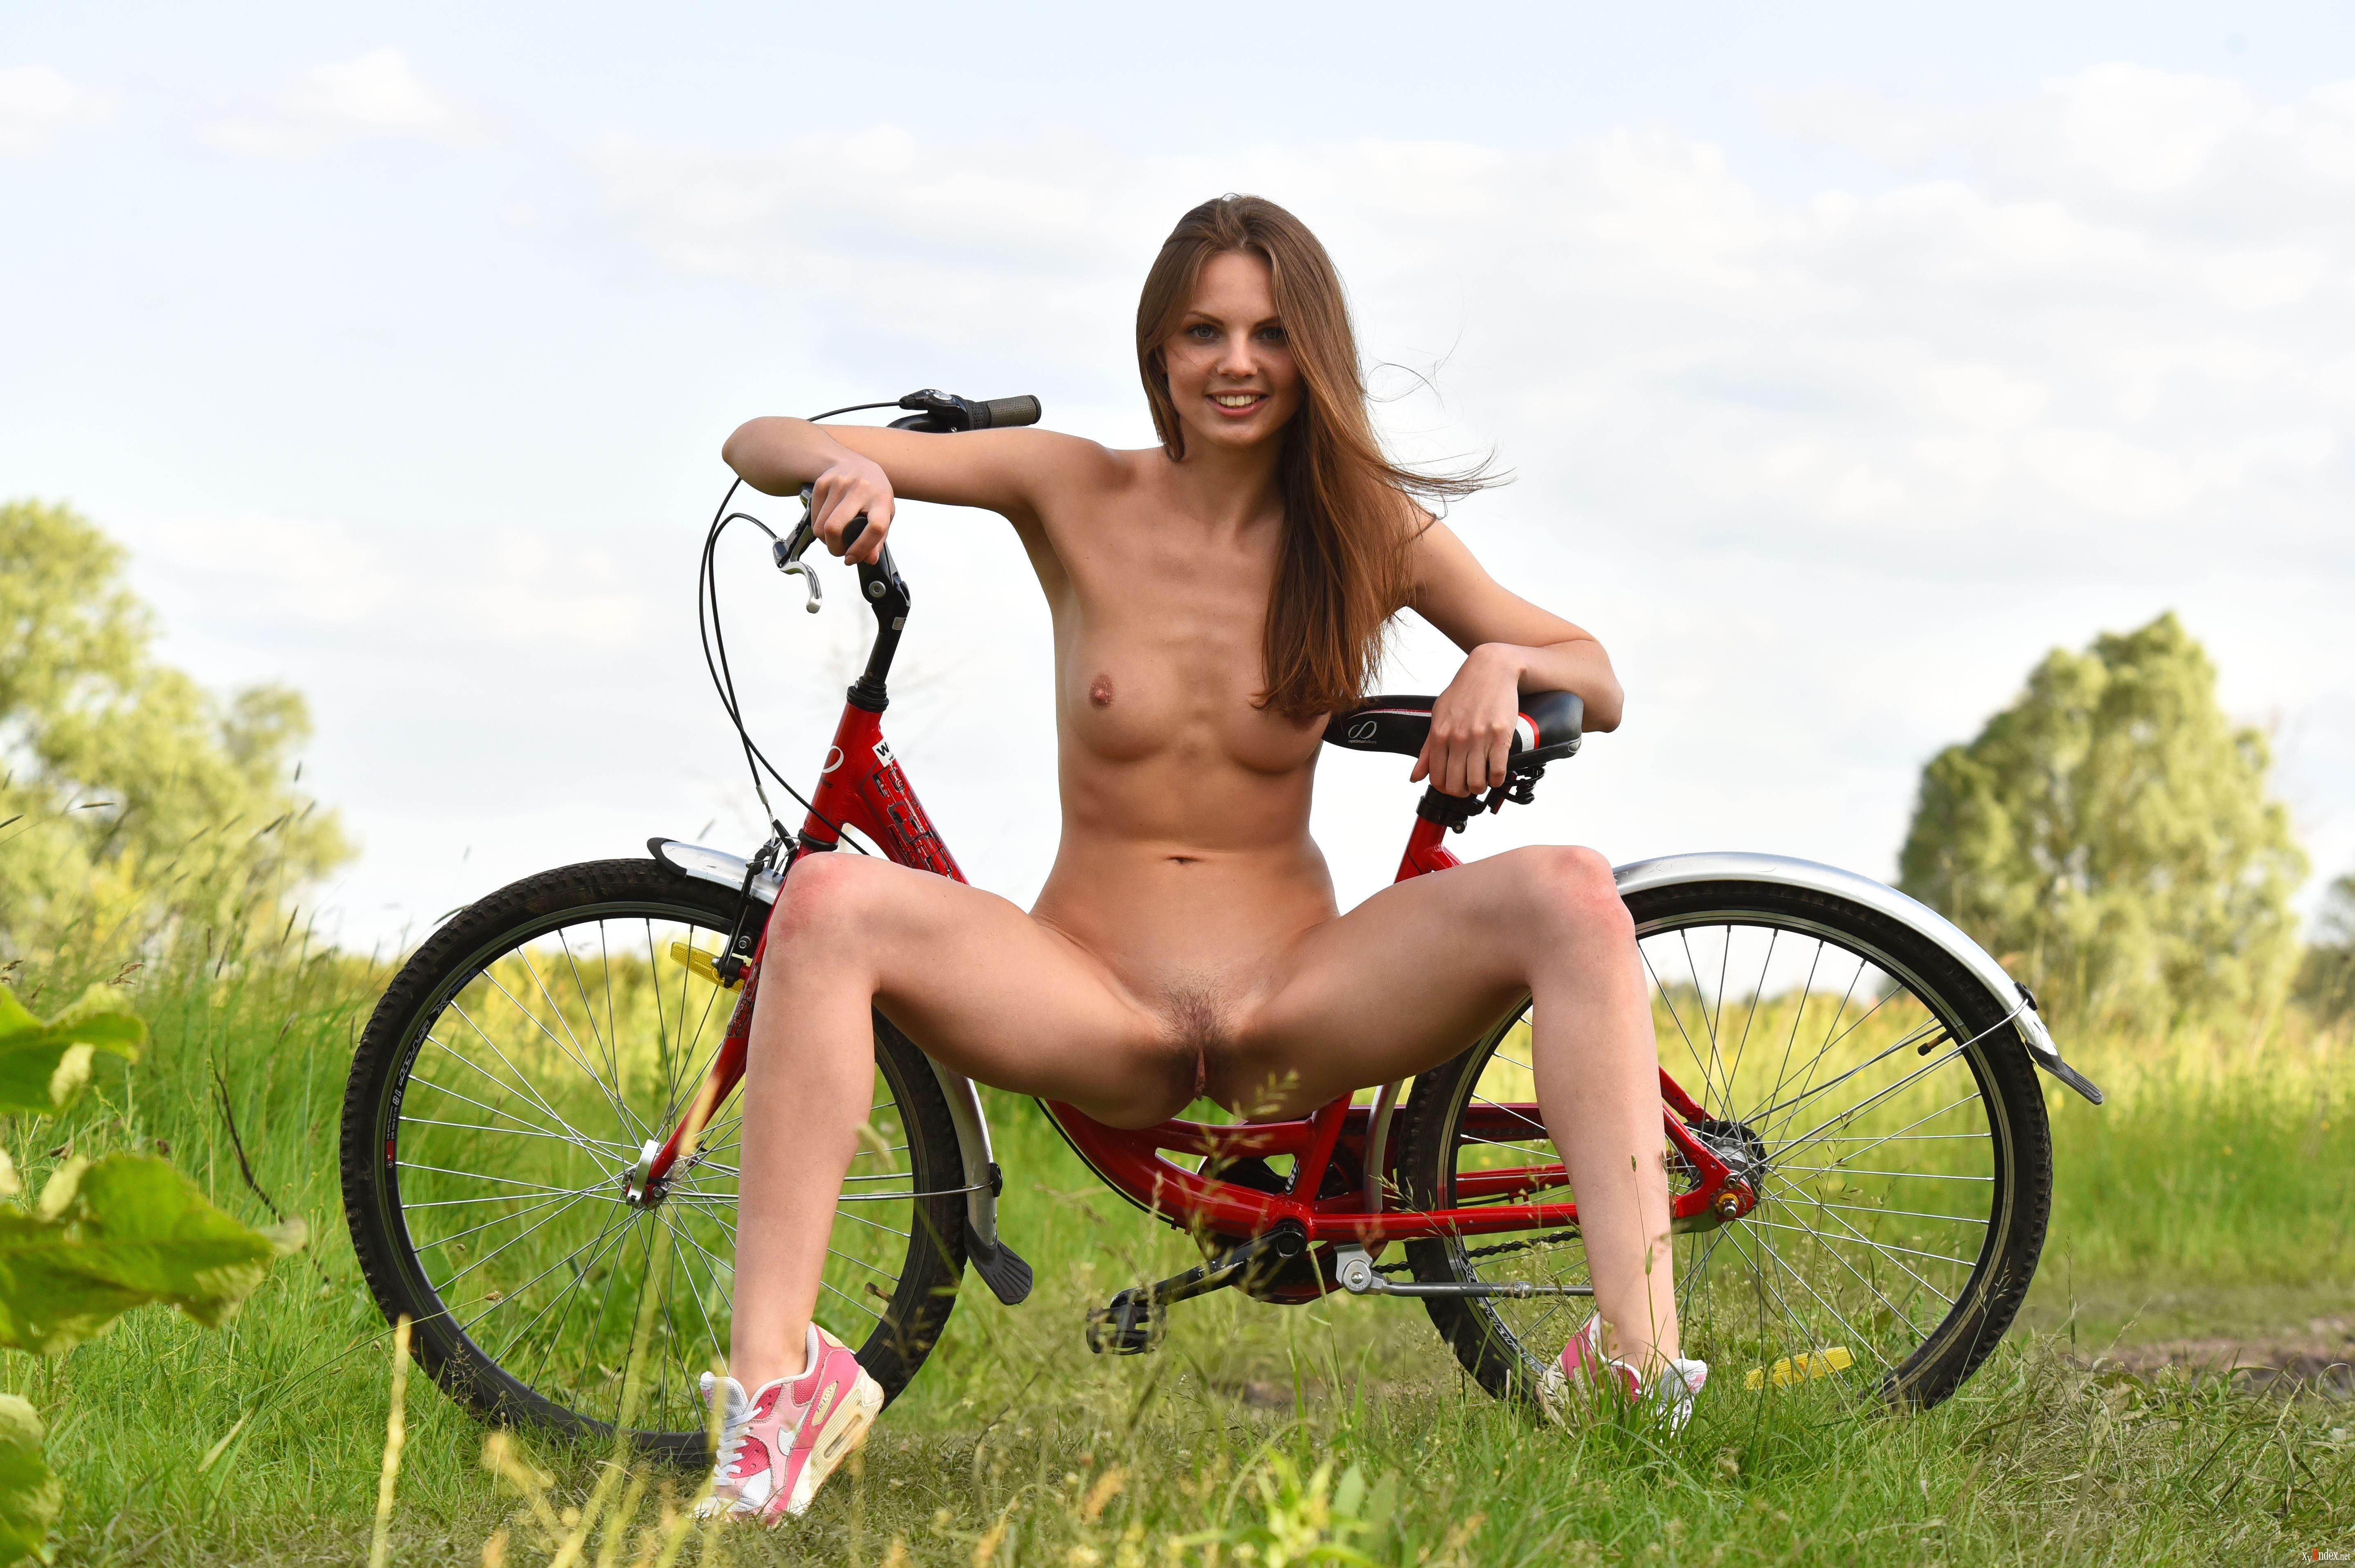 ебут велосипеде блондинку на